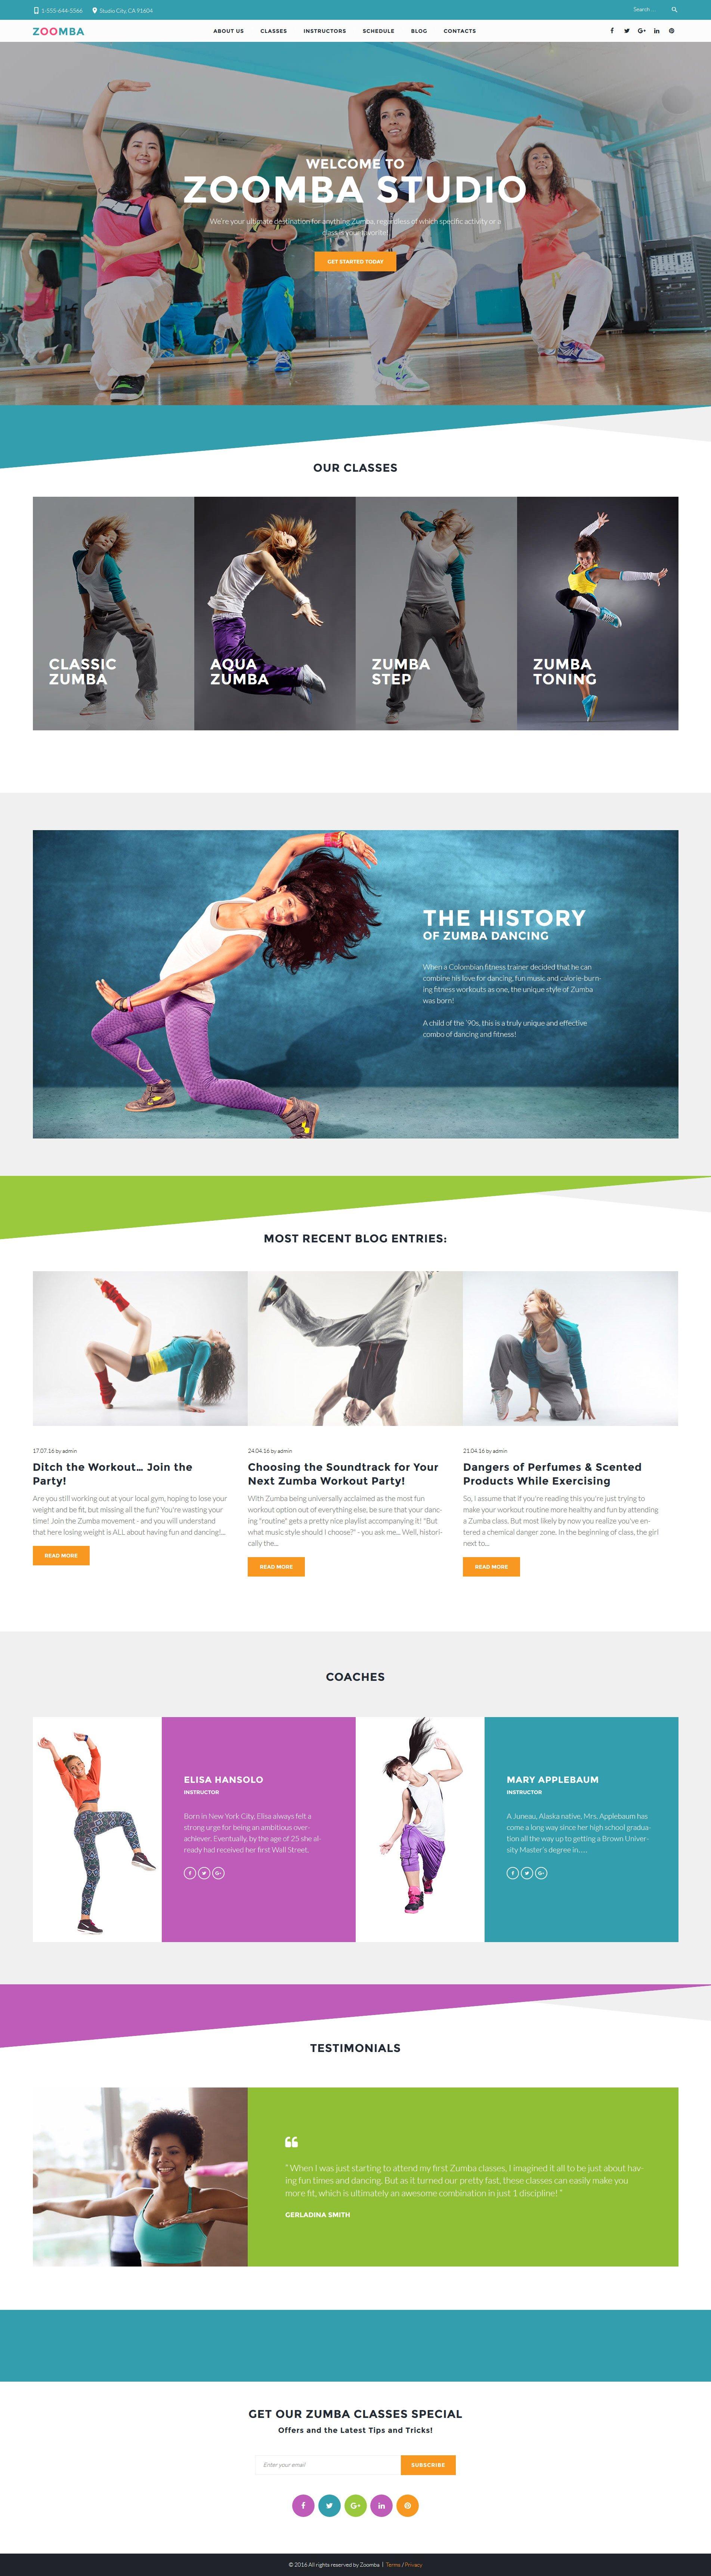 Zoomba - Zoomba Dance Studio Tema WordPress №61364